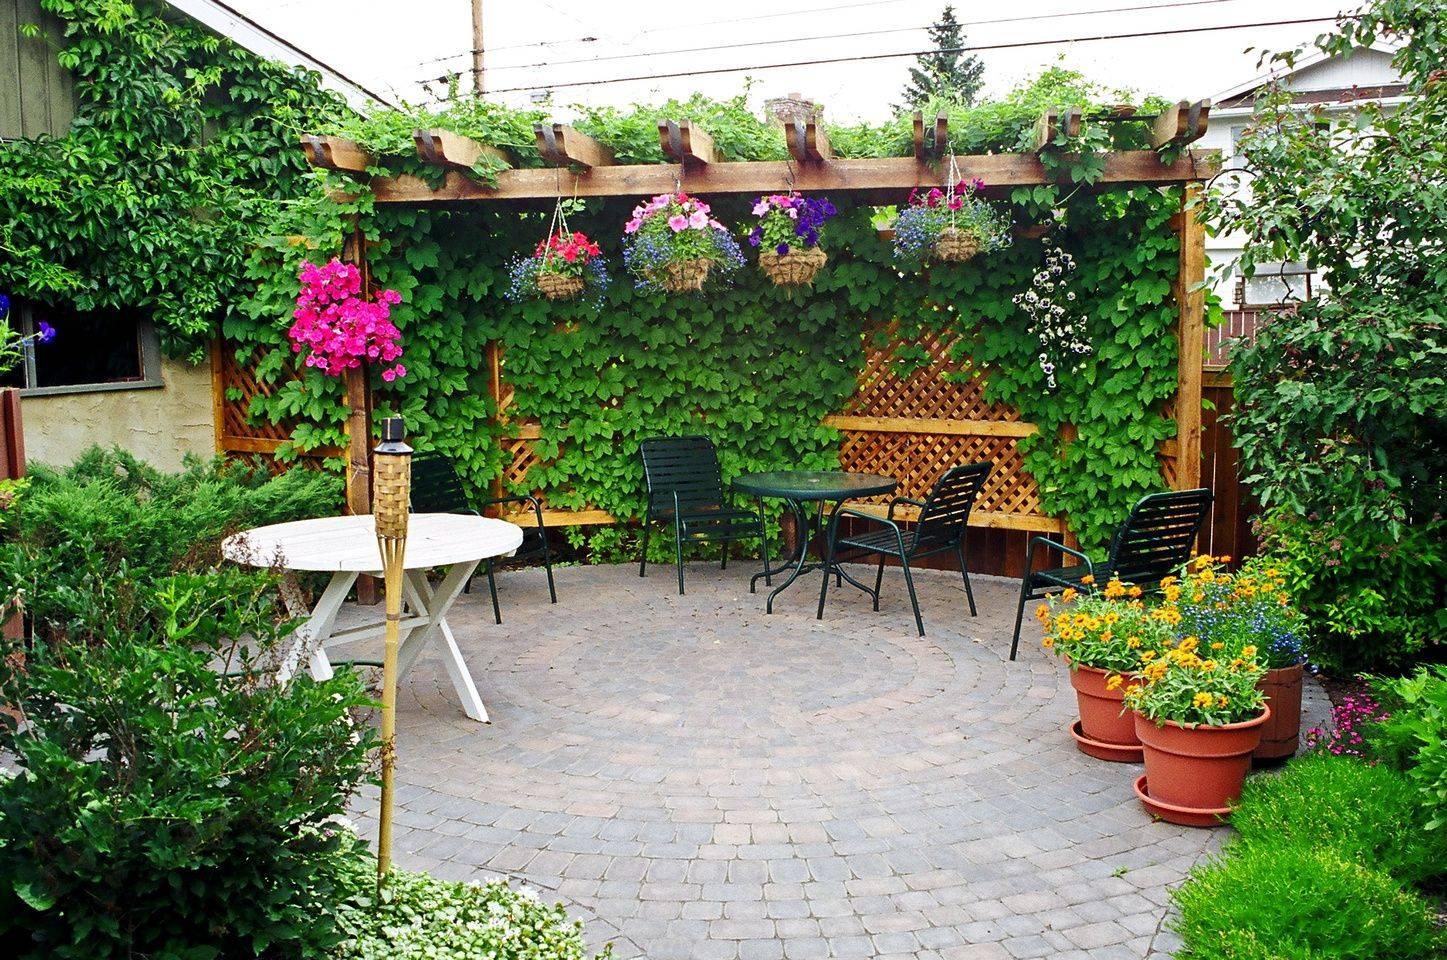 Pergola with Potted Plants Decor